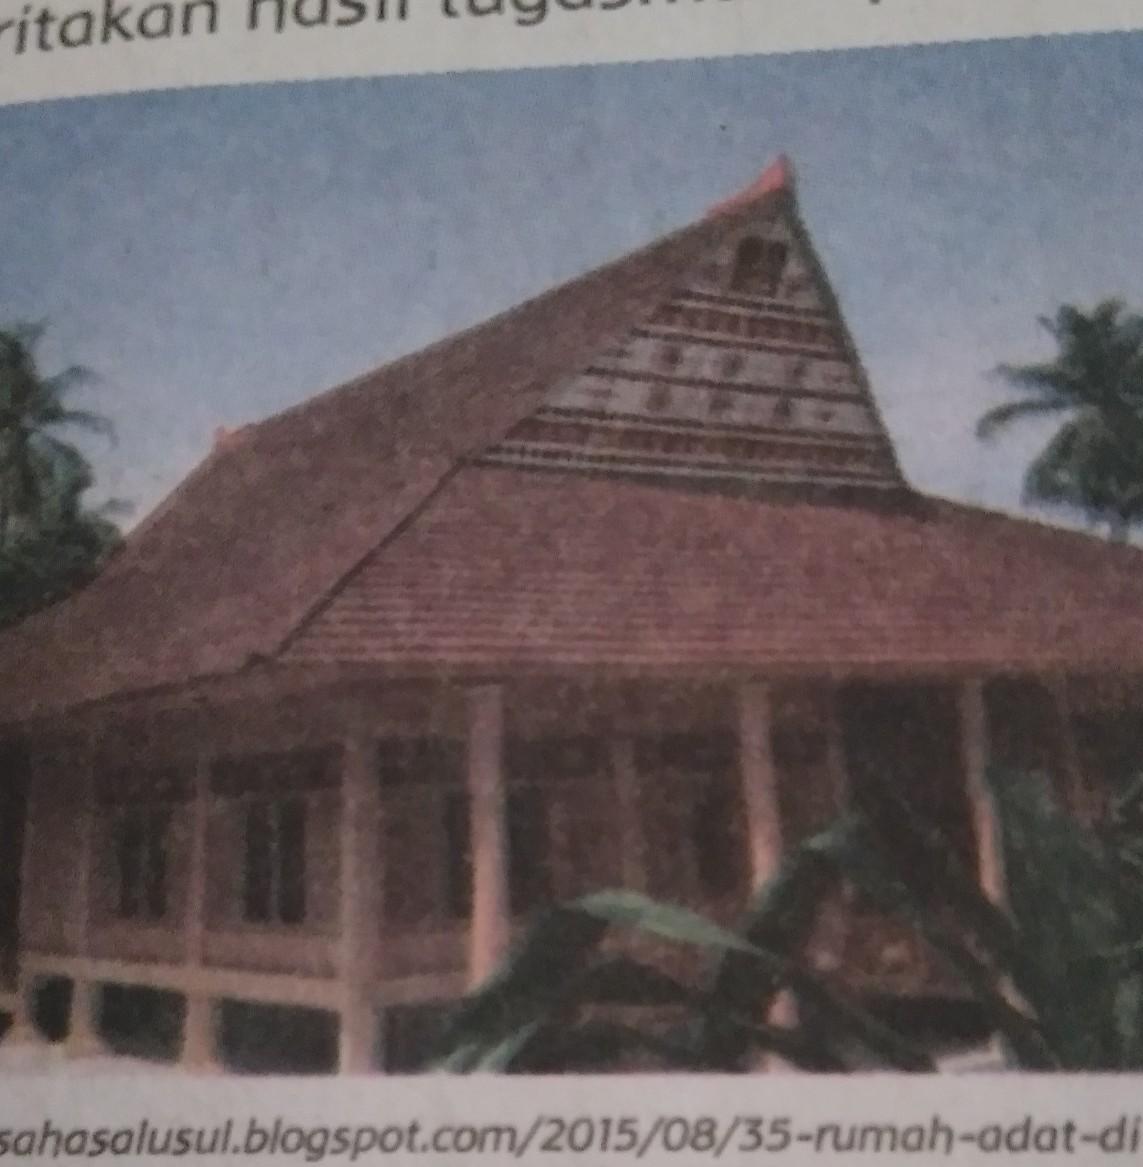 Itu Gambar Rumah Adat Baileo Asal Provinsi Keunikan Tolong Dijawab Kak Plieesss Jan Ngasal Brainly Co Id